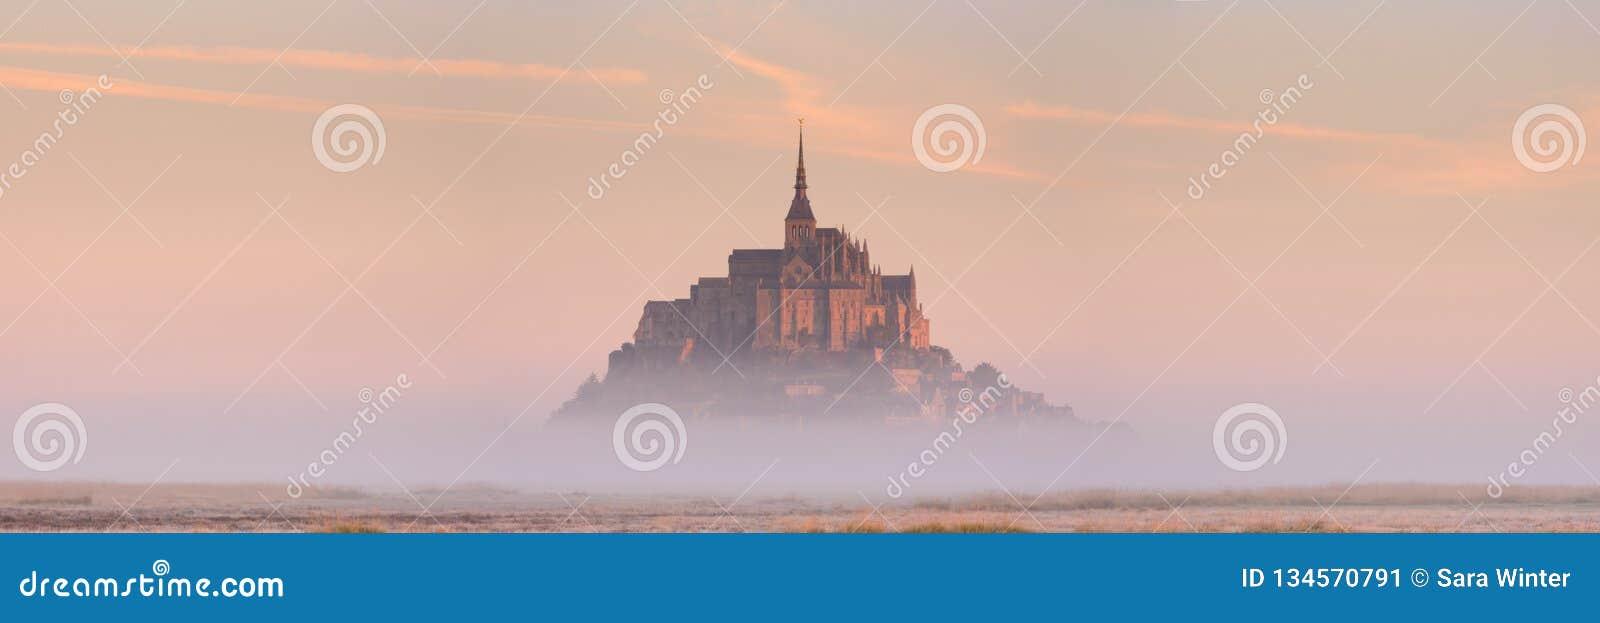 Le Mont Saint Michel in Normandië, Frankrijk bij zonsopgang